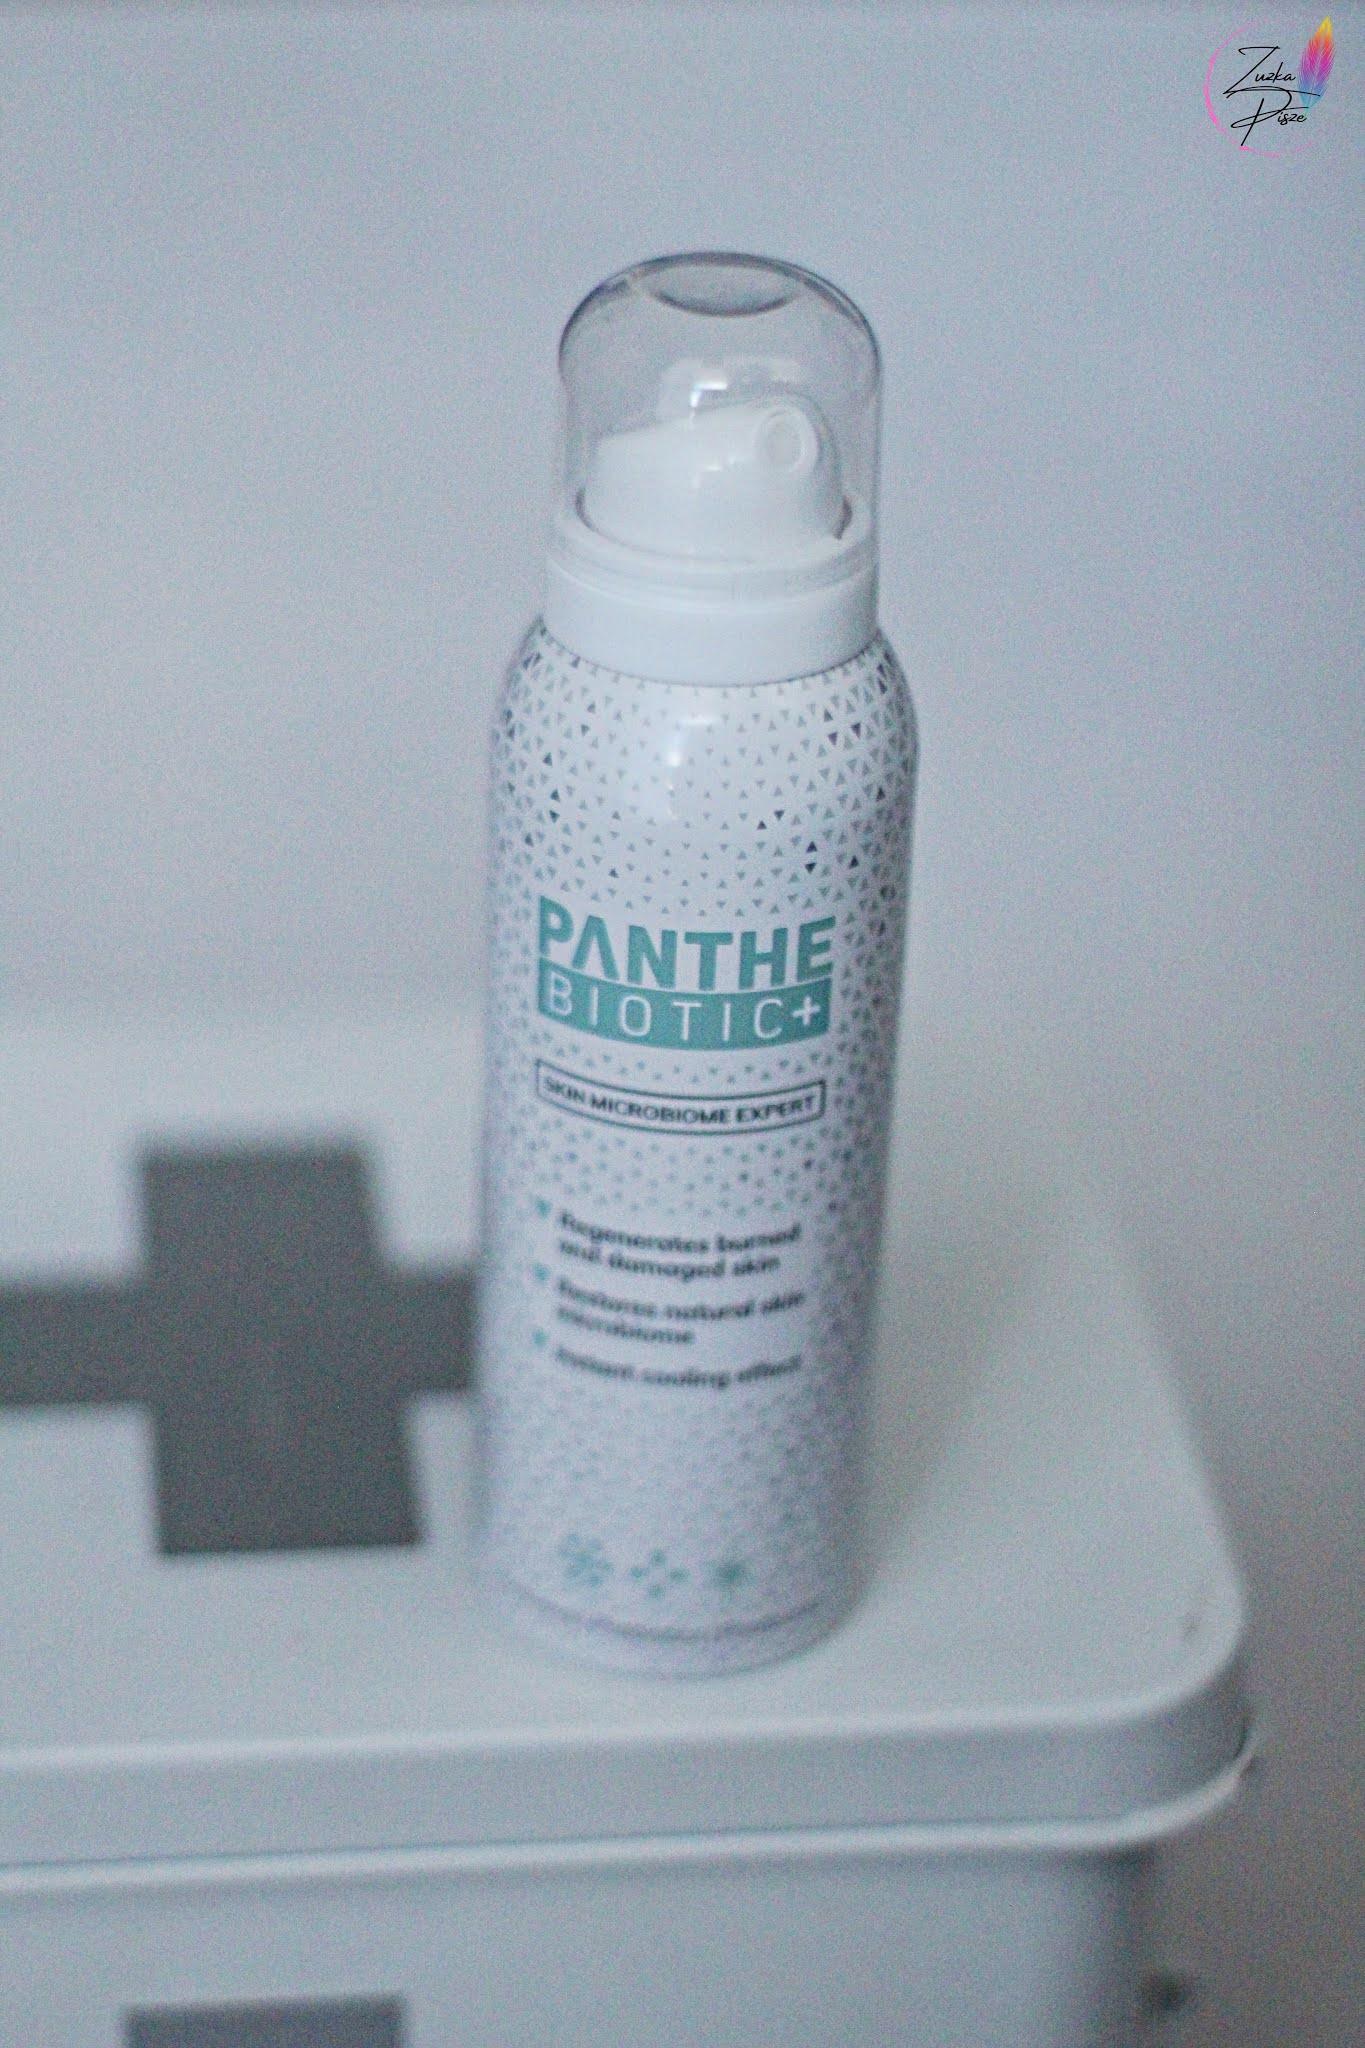 PANTHEBIOTIC – SKIN MIKROBIOME EXPERT - delikatna pianka dla podrażnionej skóry